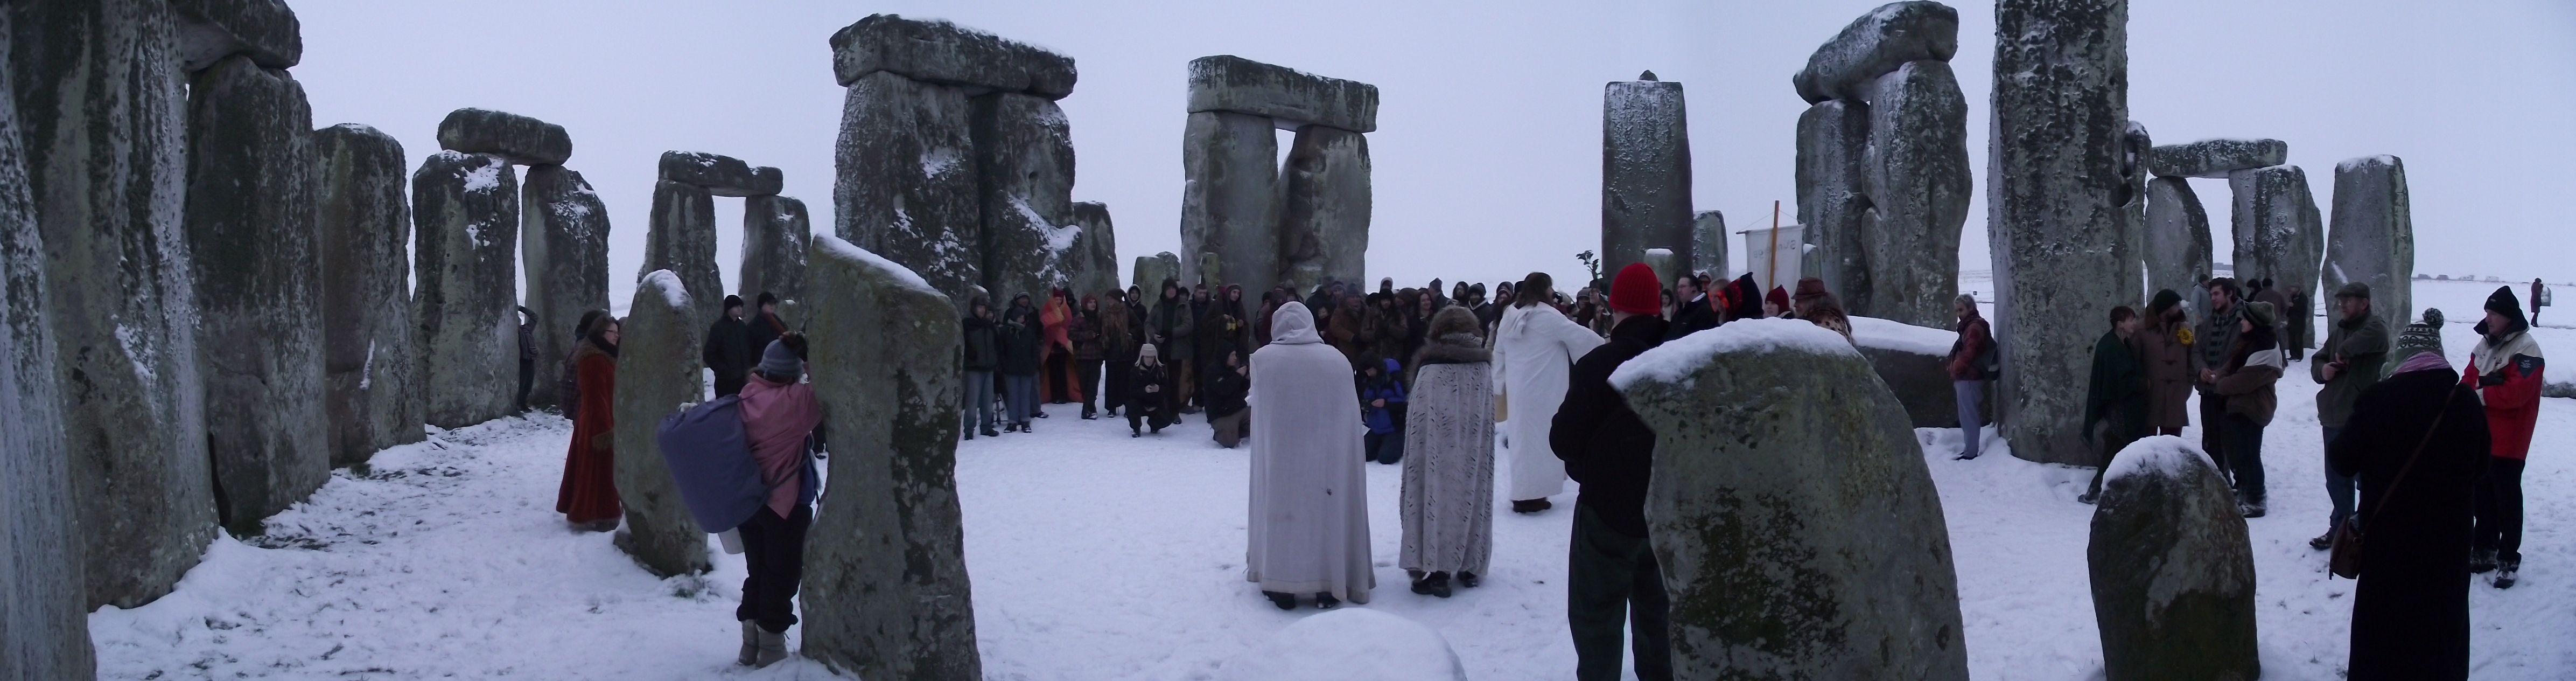 Stonehenge Winter Solstice